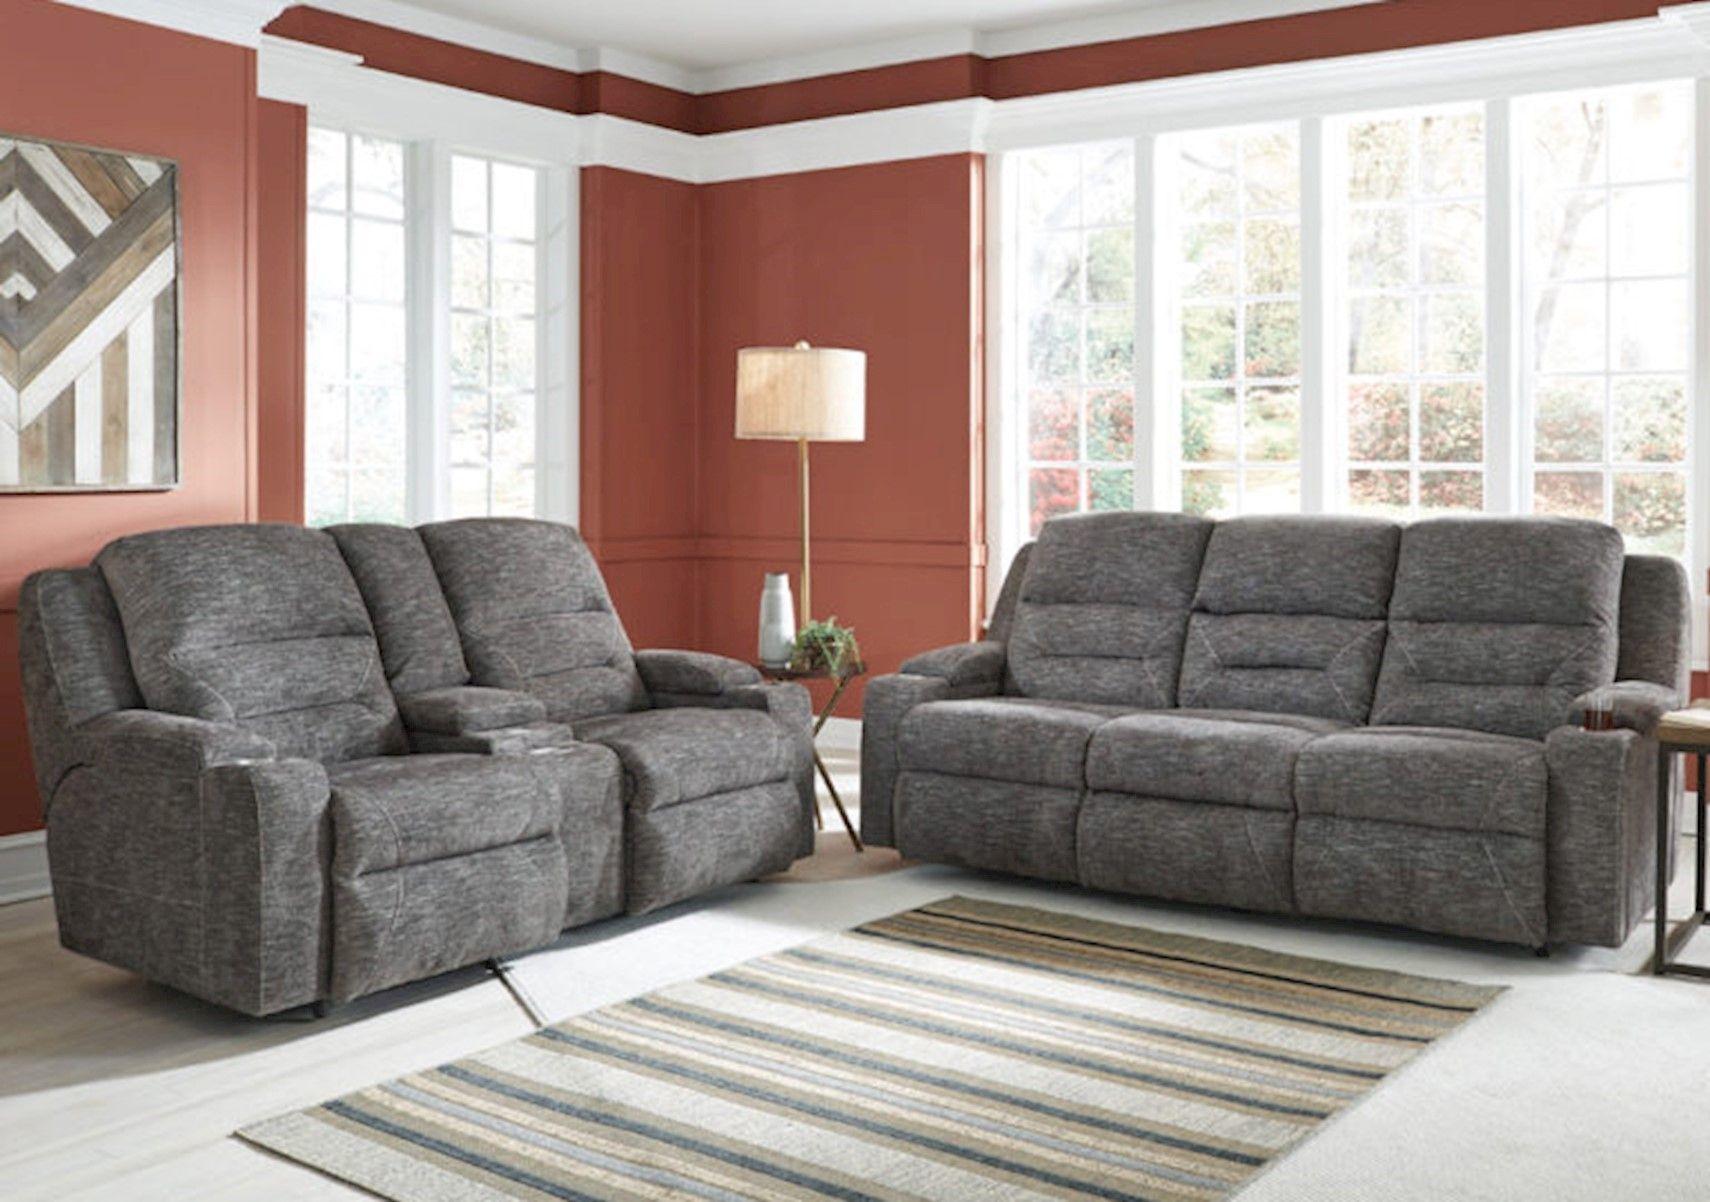 Lacks Beacon 2 Pc Power Reclining Living Room Set Living Room Sets Living Room Seating Stylish Living Room #power #living #room #sets